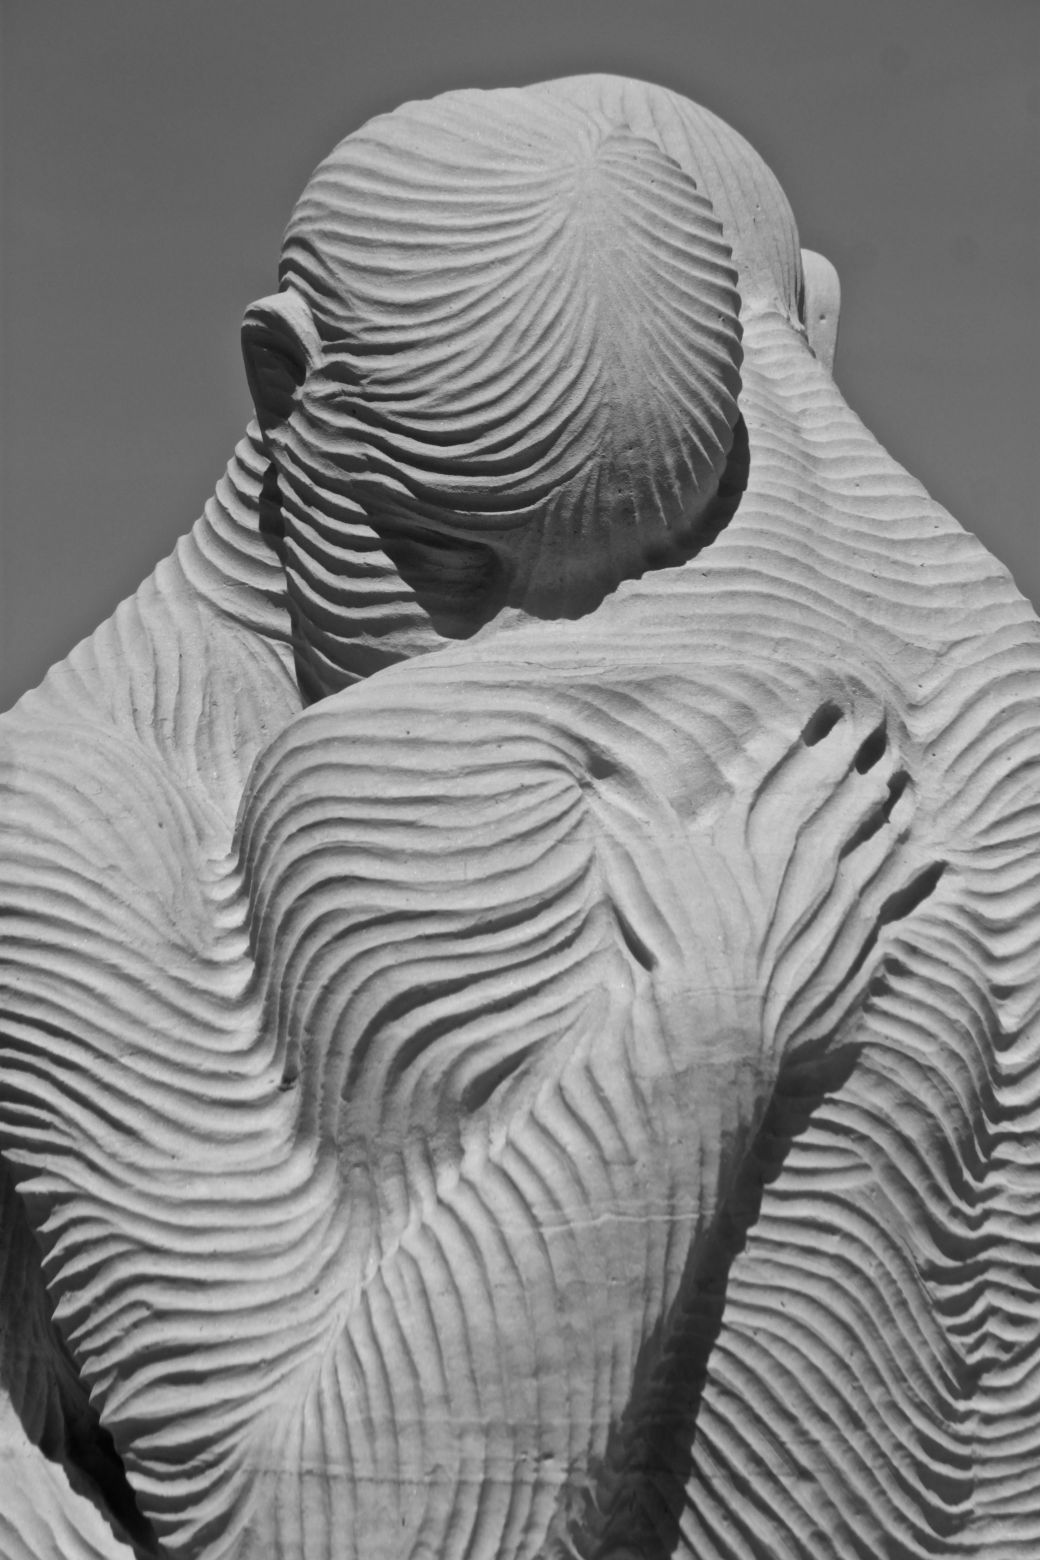 boston revere beach National Sand Sculpting Festival sand sculpture people embracing